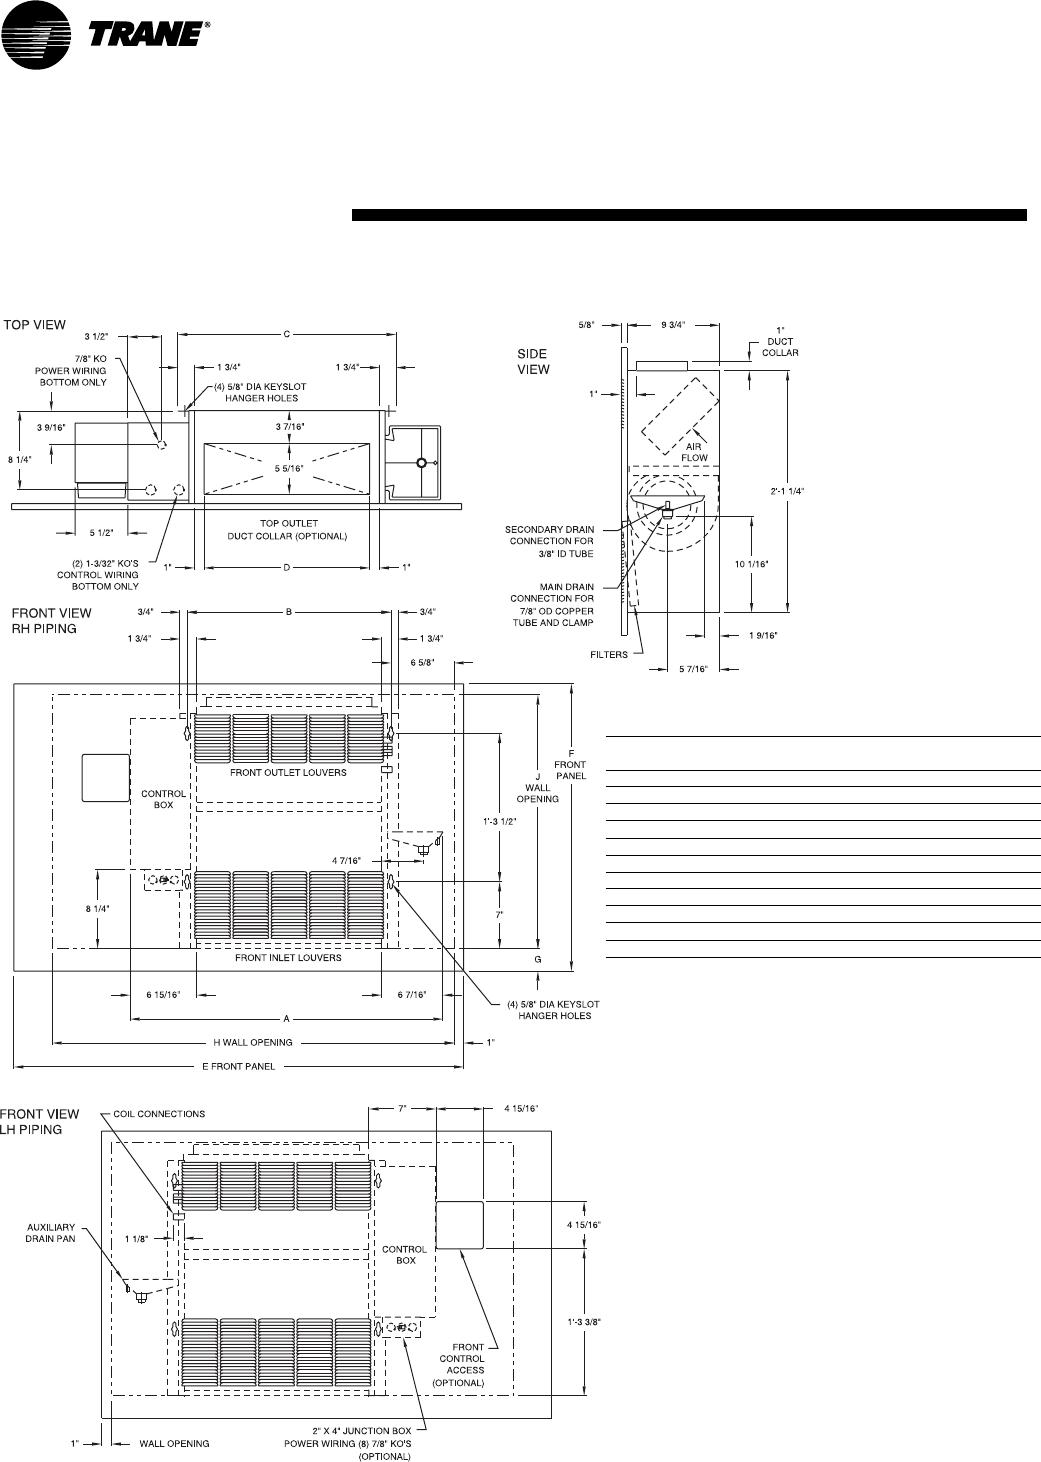 Trane Fan Coil Unit Wiring Diagram